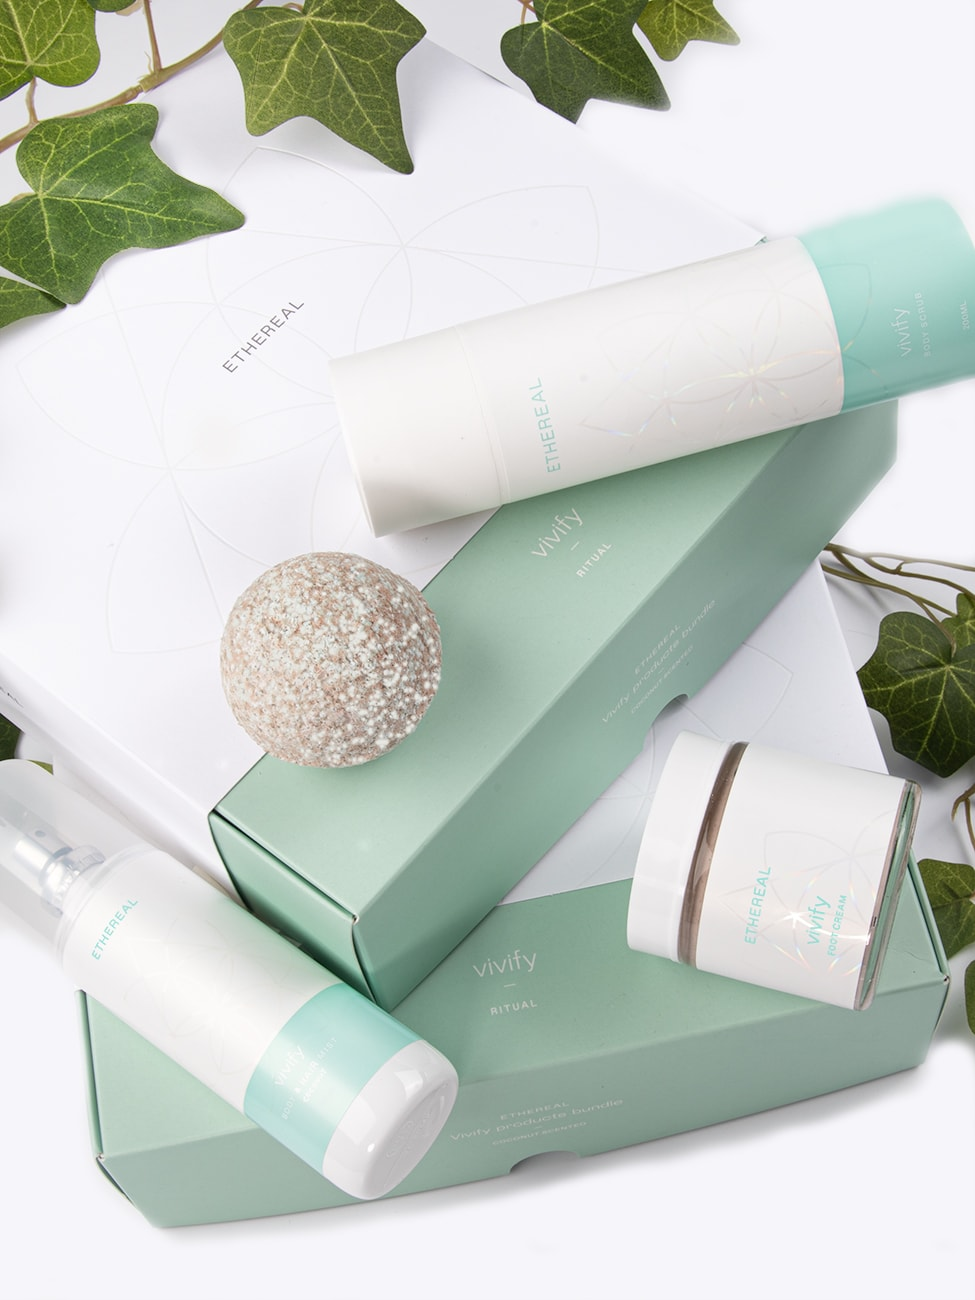 Bundle_Vivify_comp_Ethereal_Dermocosmetics_Skincare_Handmade_Greek_Products